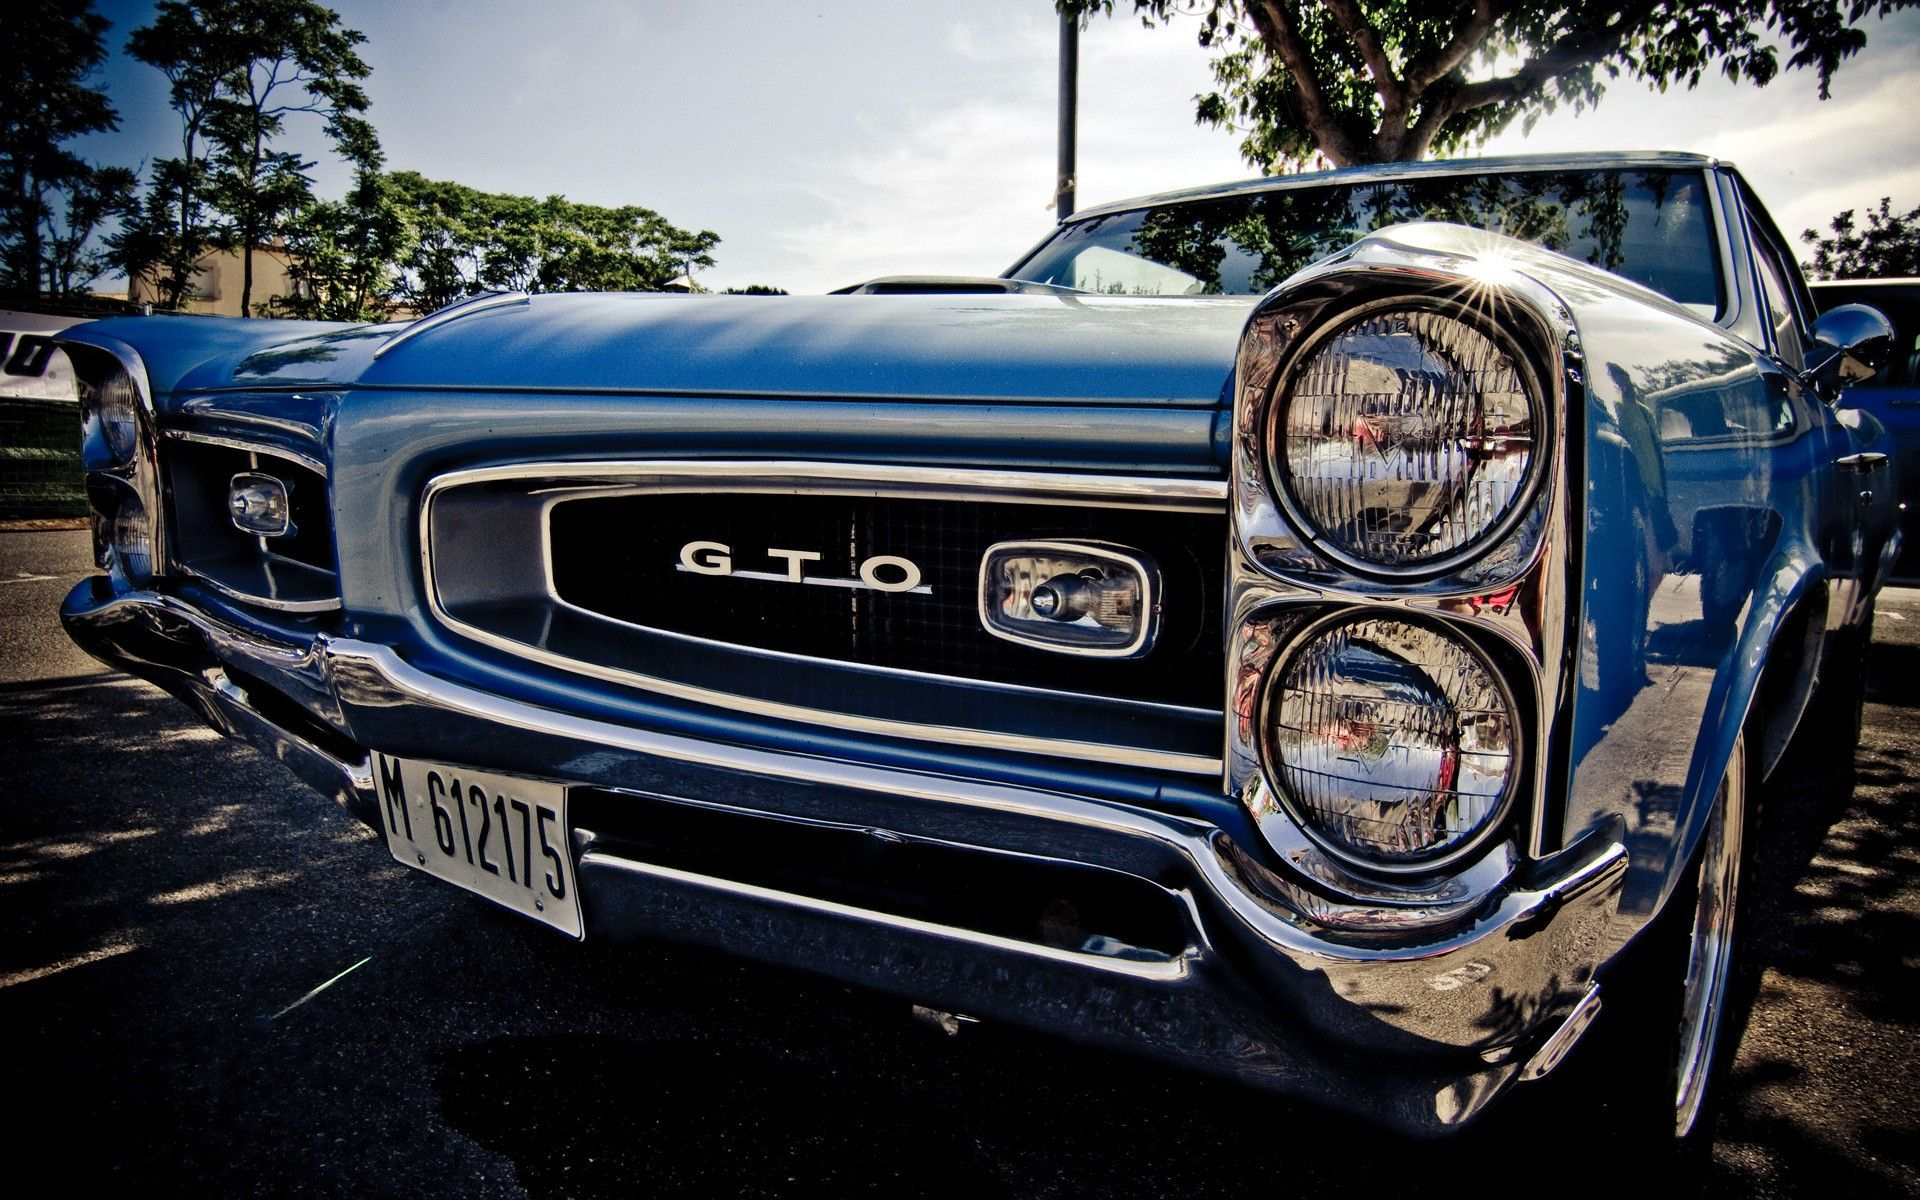 Cars Muscle Cars Pontiac Gto Wallpaper Autos Y